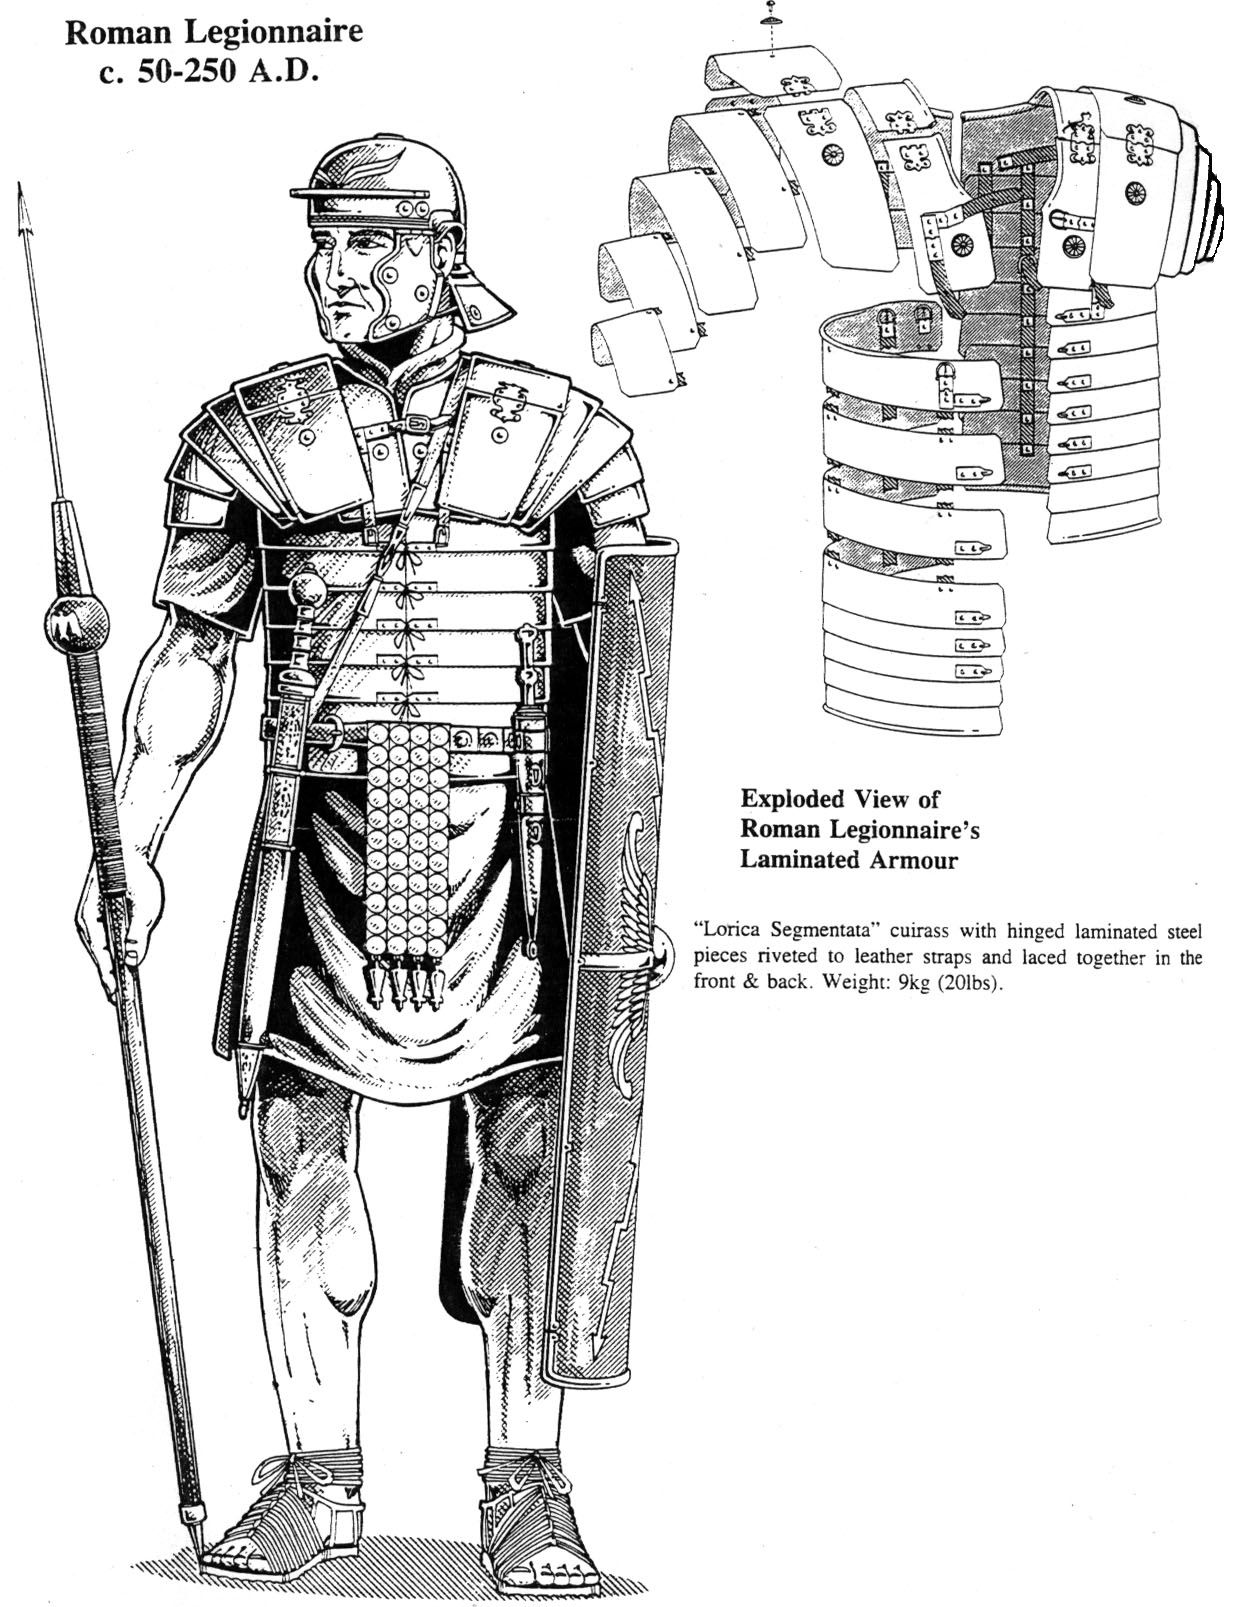 Army Armor Diagram - Wiring Diagram •